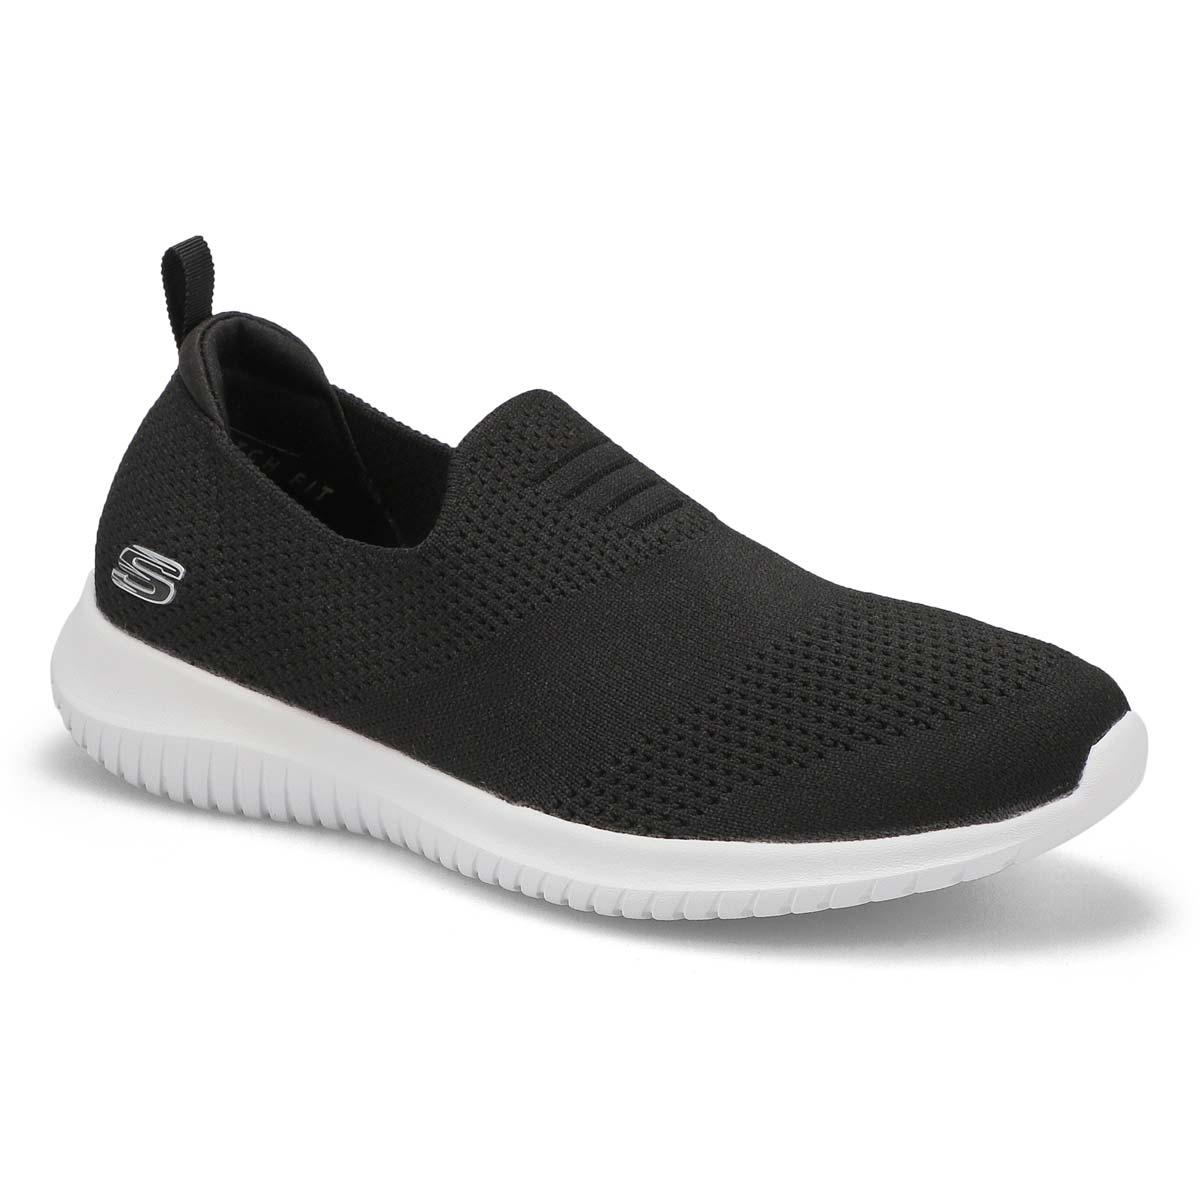 Lds Ultra Flex Harmonious black sneaker